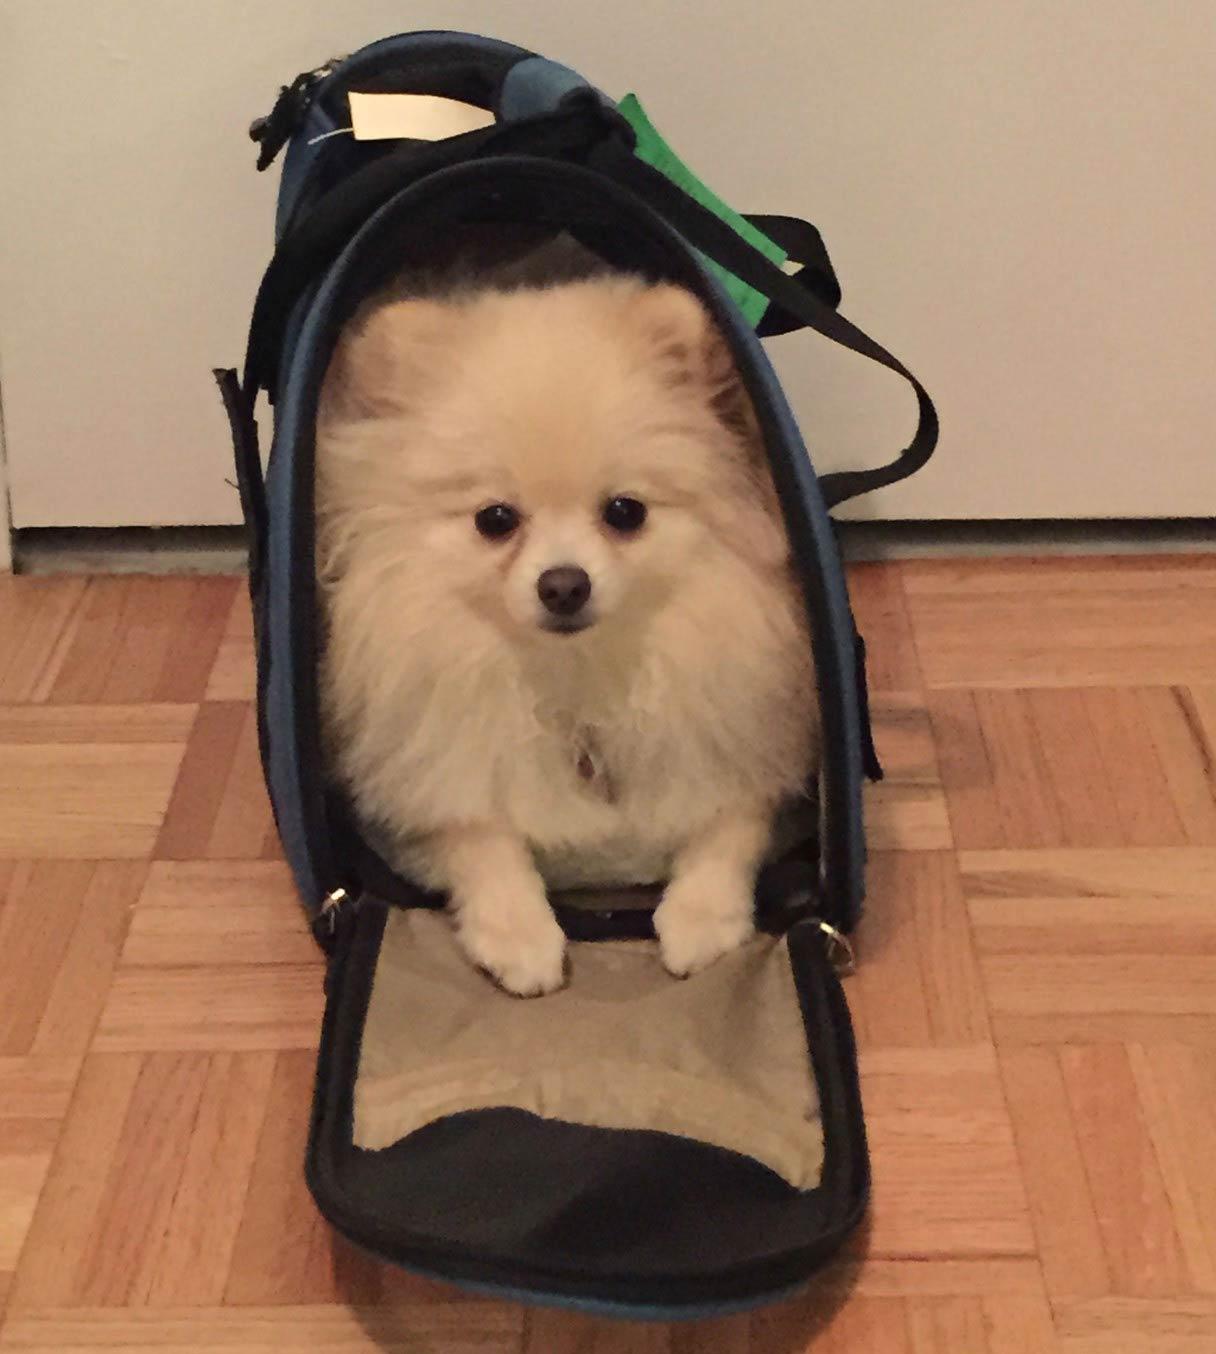 pomeranian in dog carrier